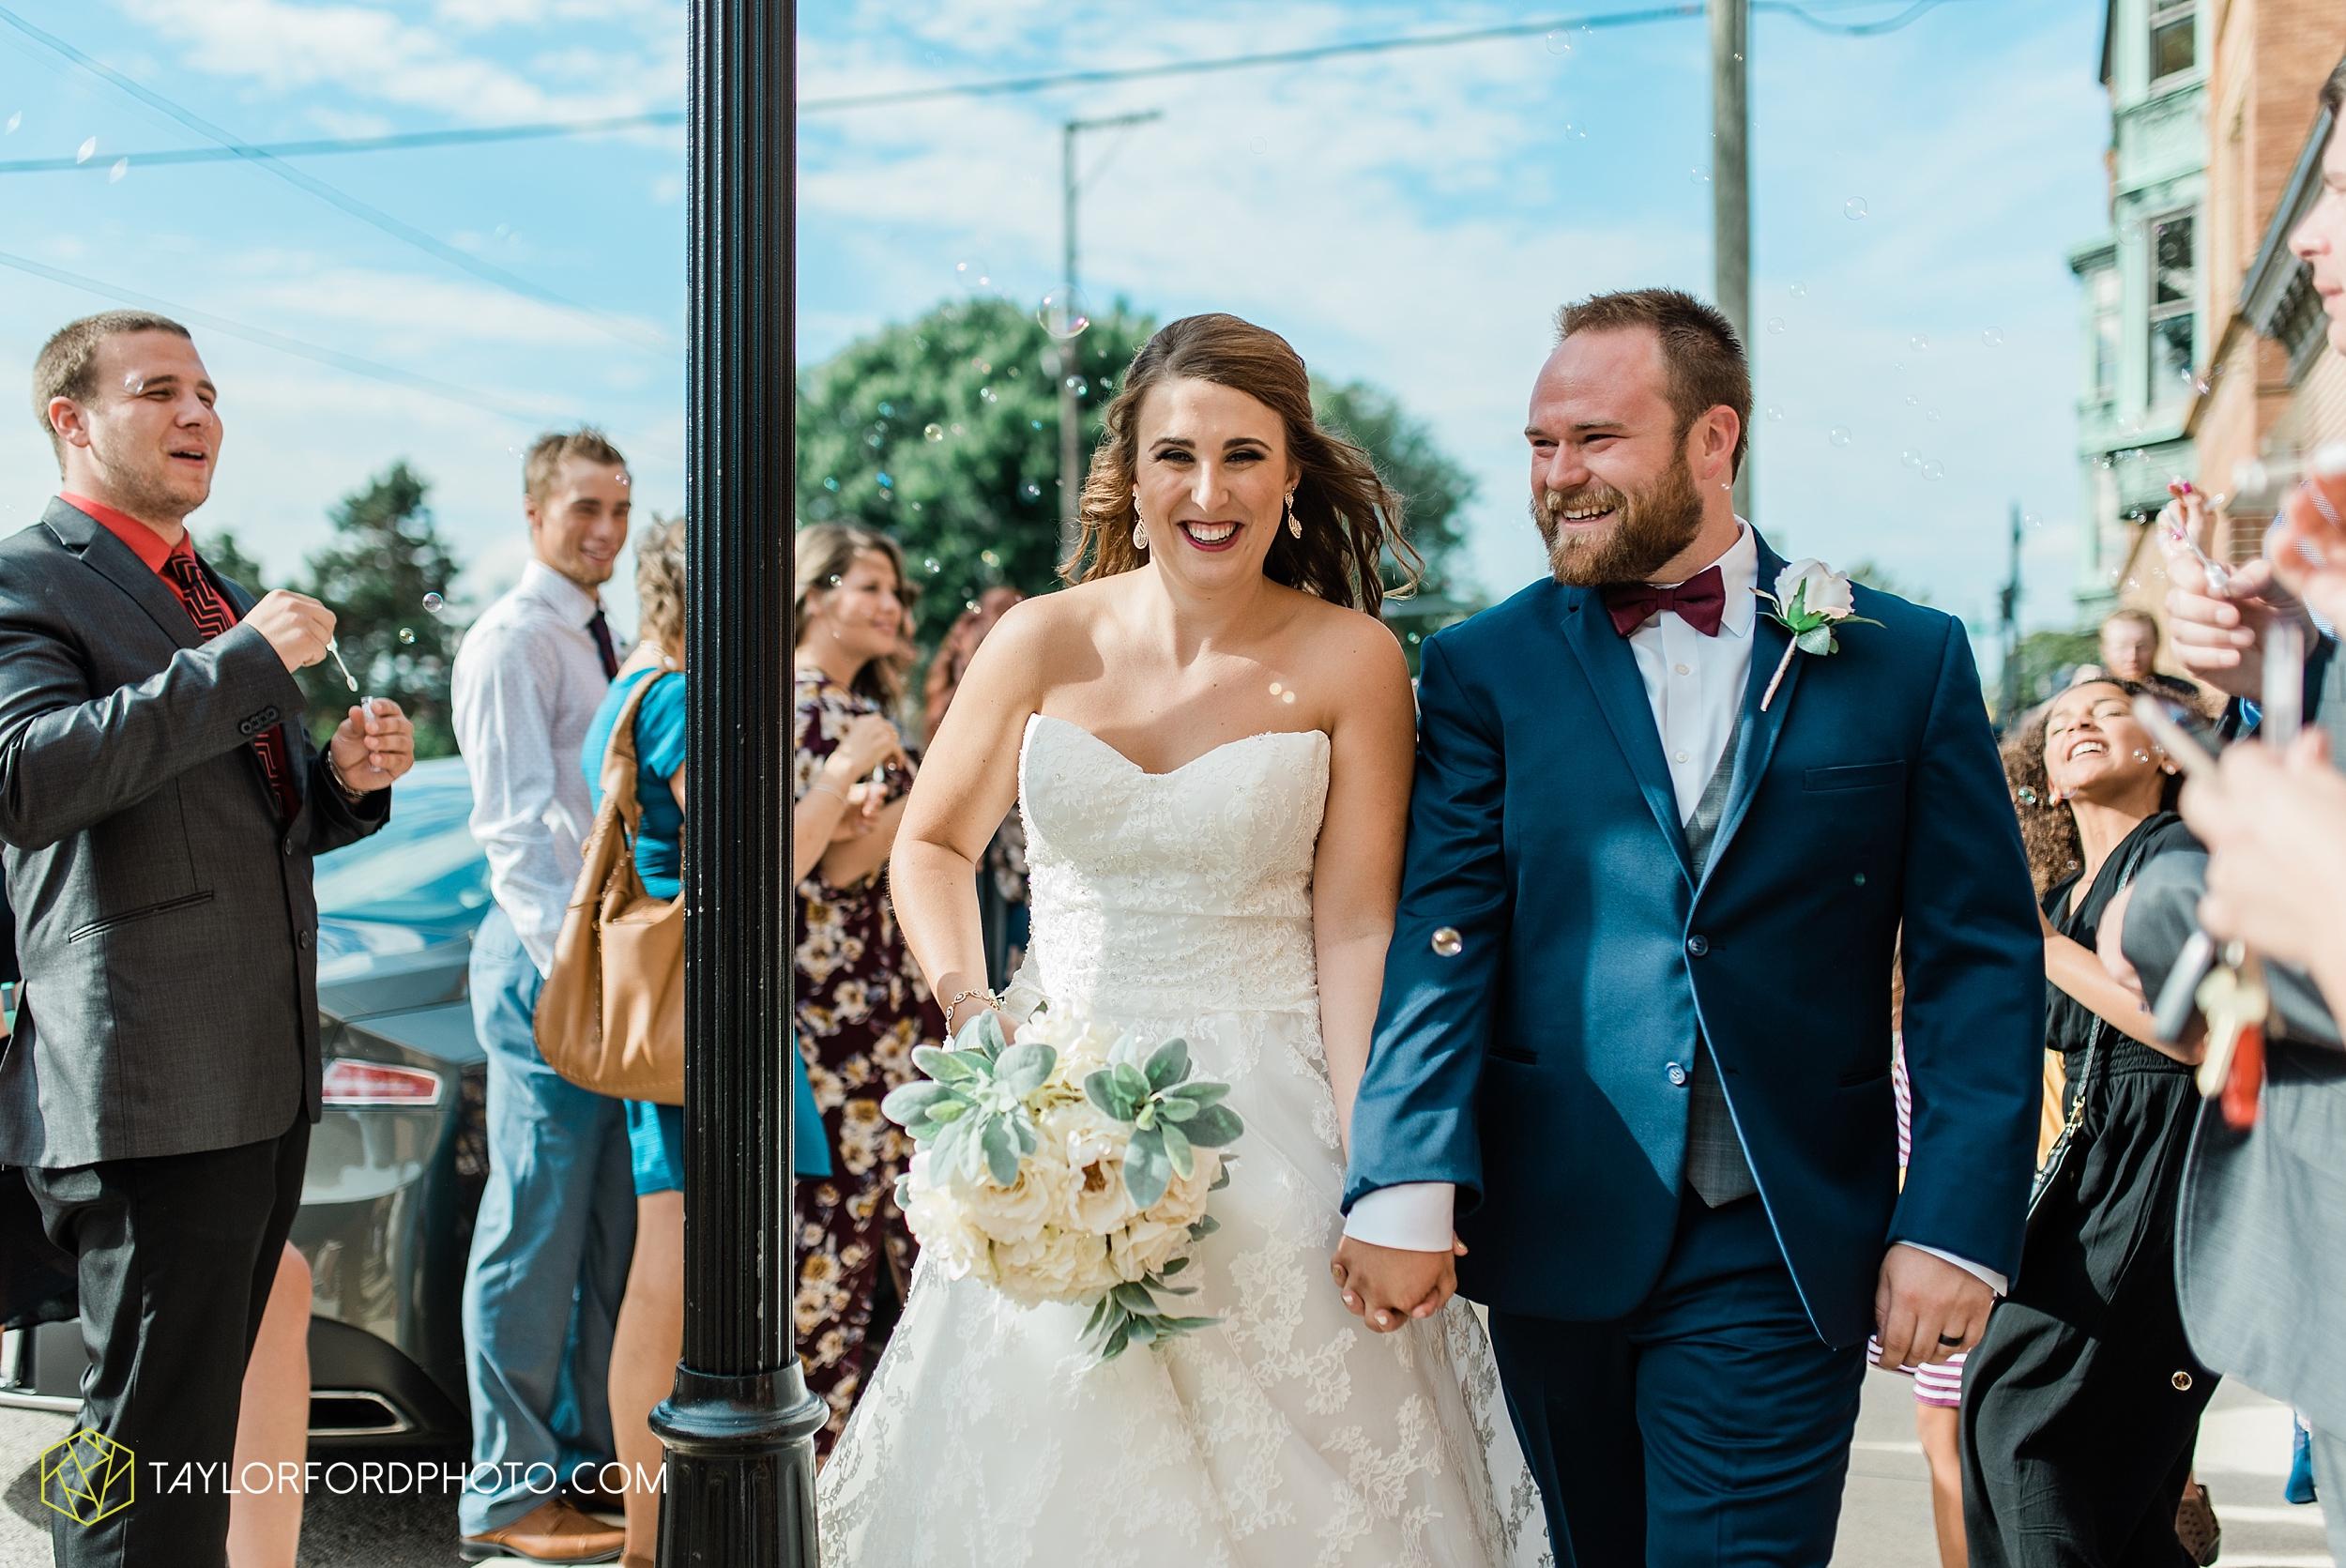 chelsey-zosh-jackson-young-first-united-methodist-church-senior-center-van-wert-ohio-wedding-photographer-taylor-ford-photography_0074.jpg